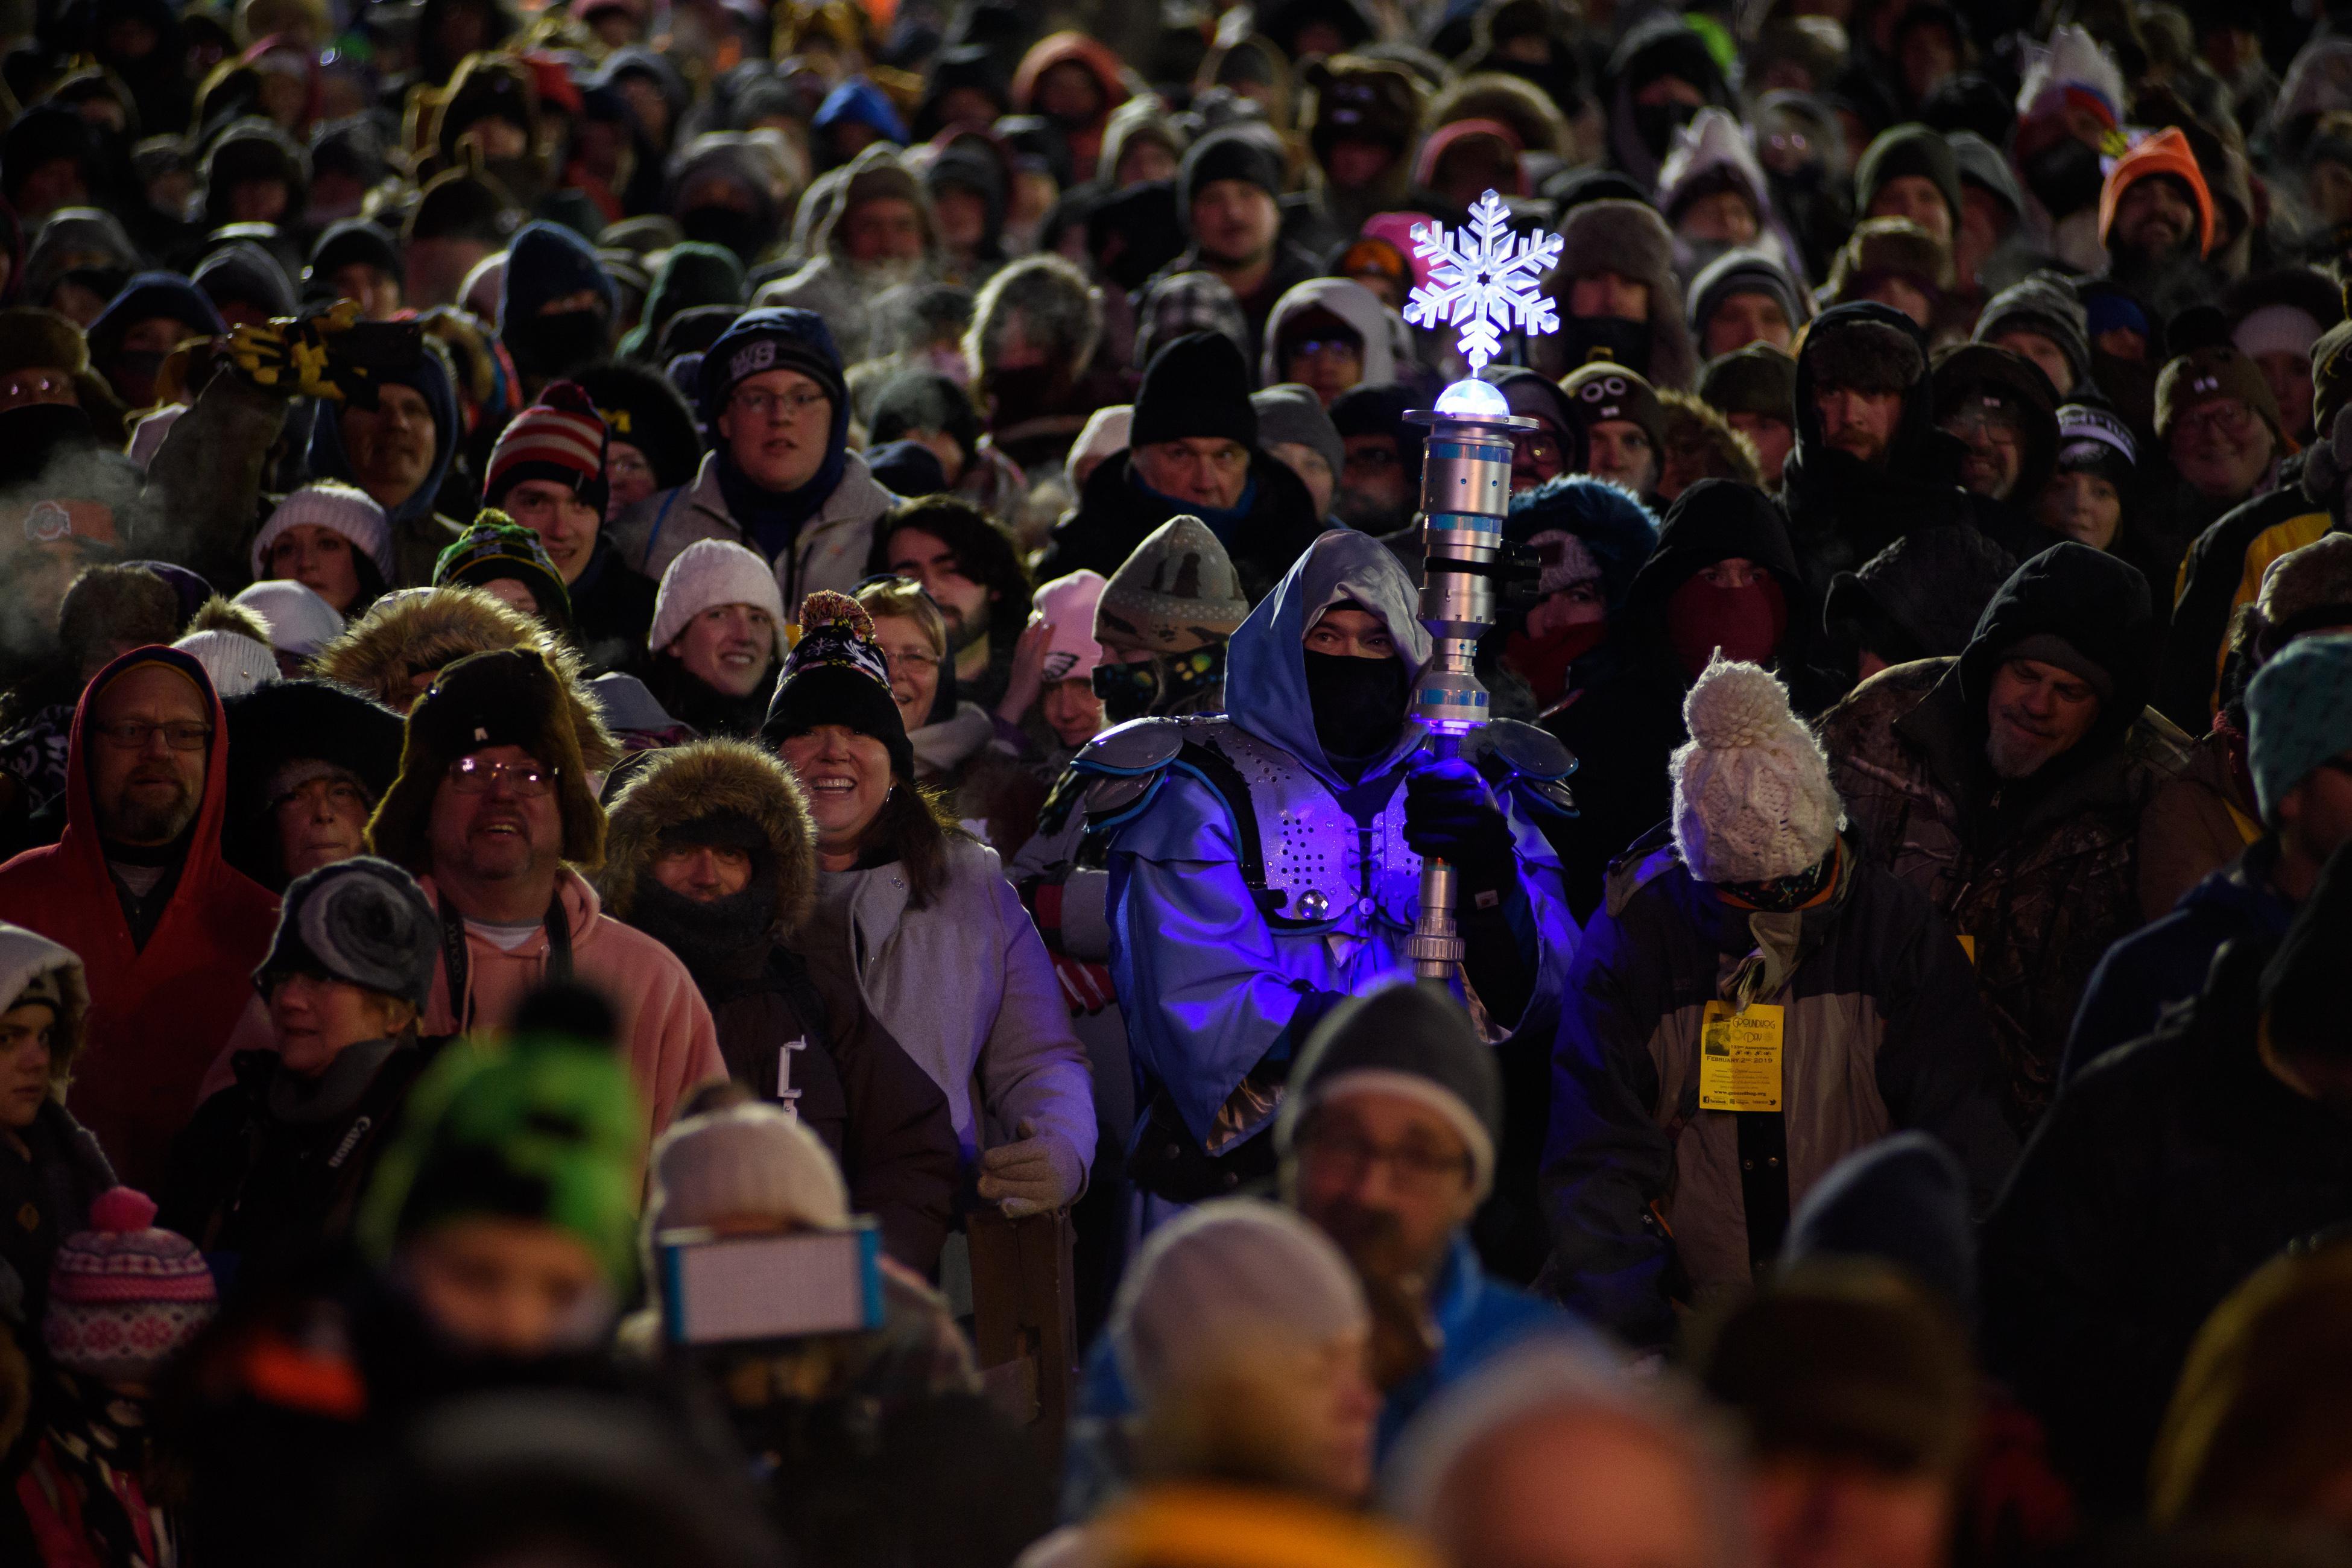 Cold visitors await Punxsutawney Phil on February 2, 2019 in Punxsutawney, Pennsylvania.